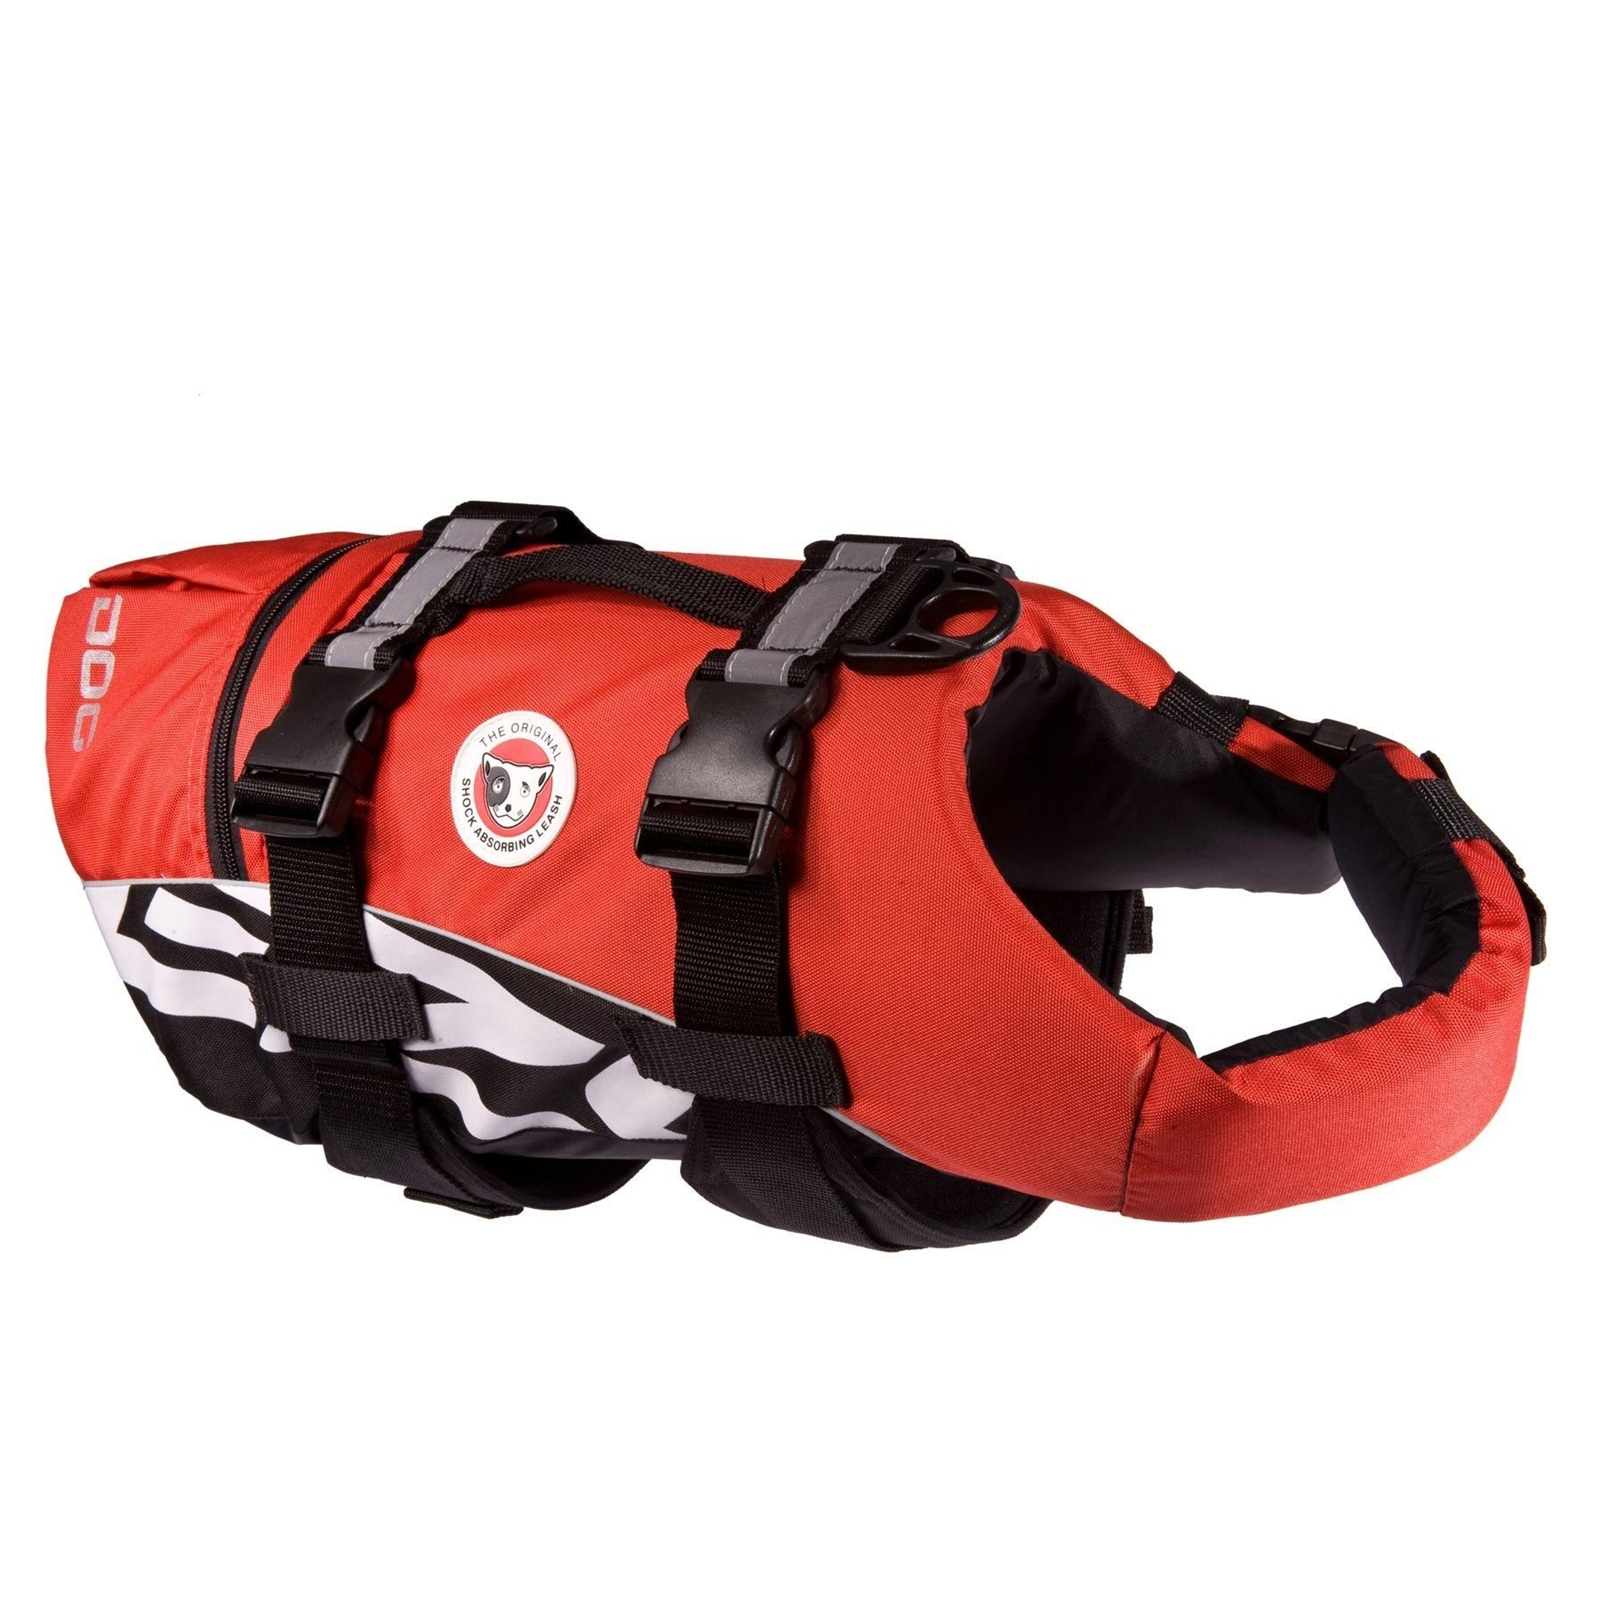 c7802 - SeaDog Zwemvest - rood